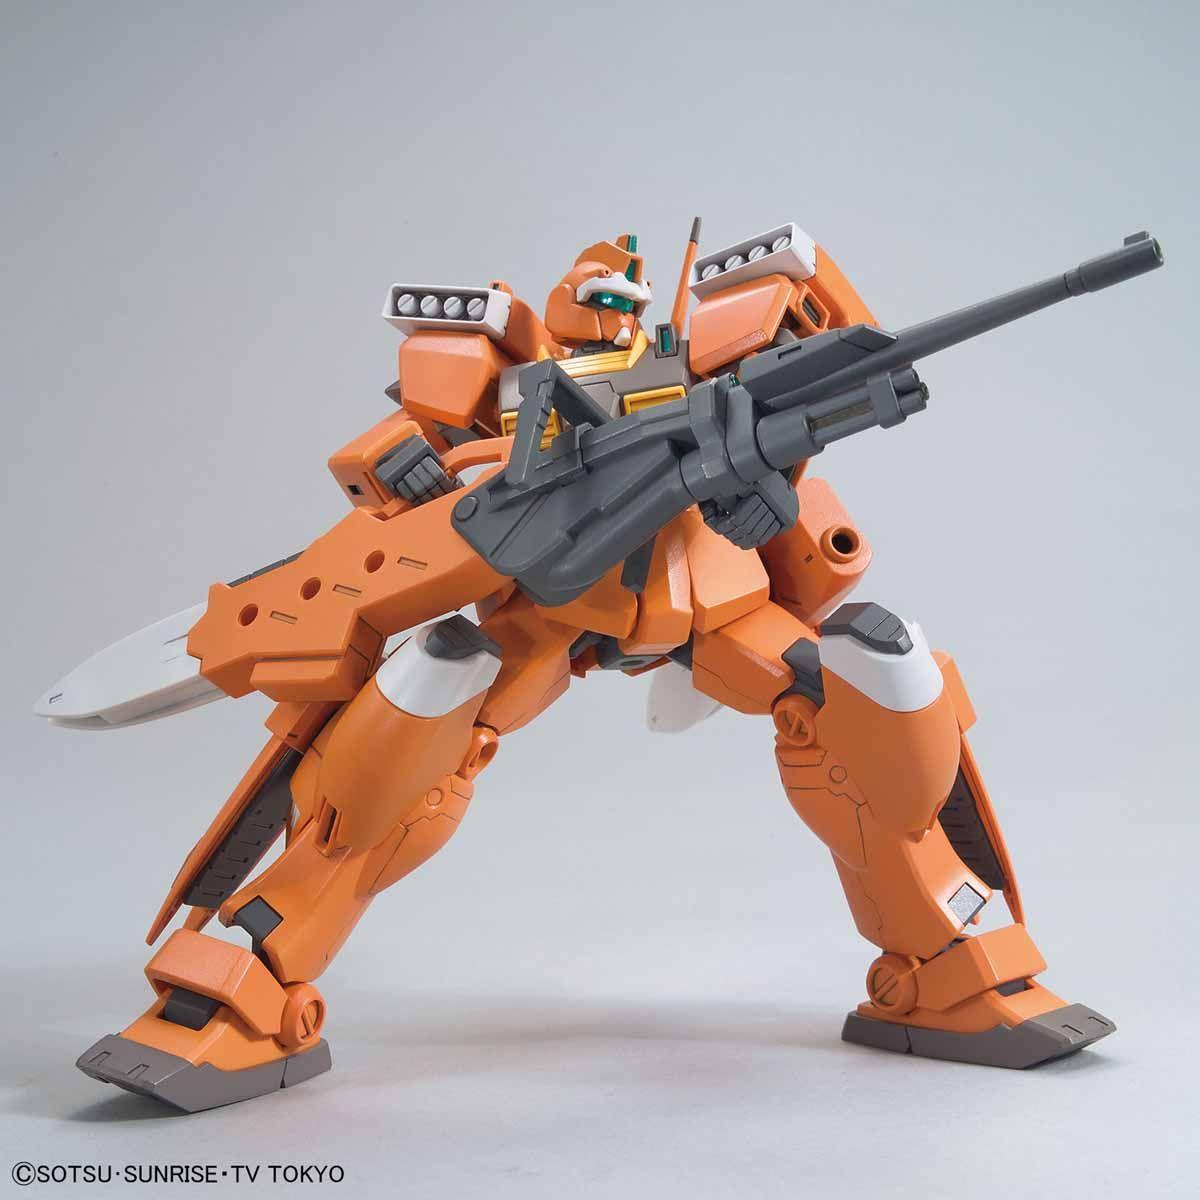 GM III Beam Master HG 1/144 Bandai